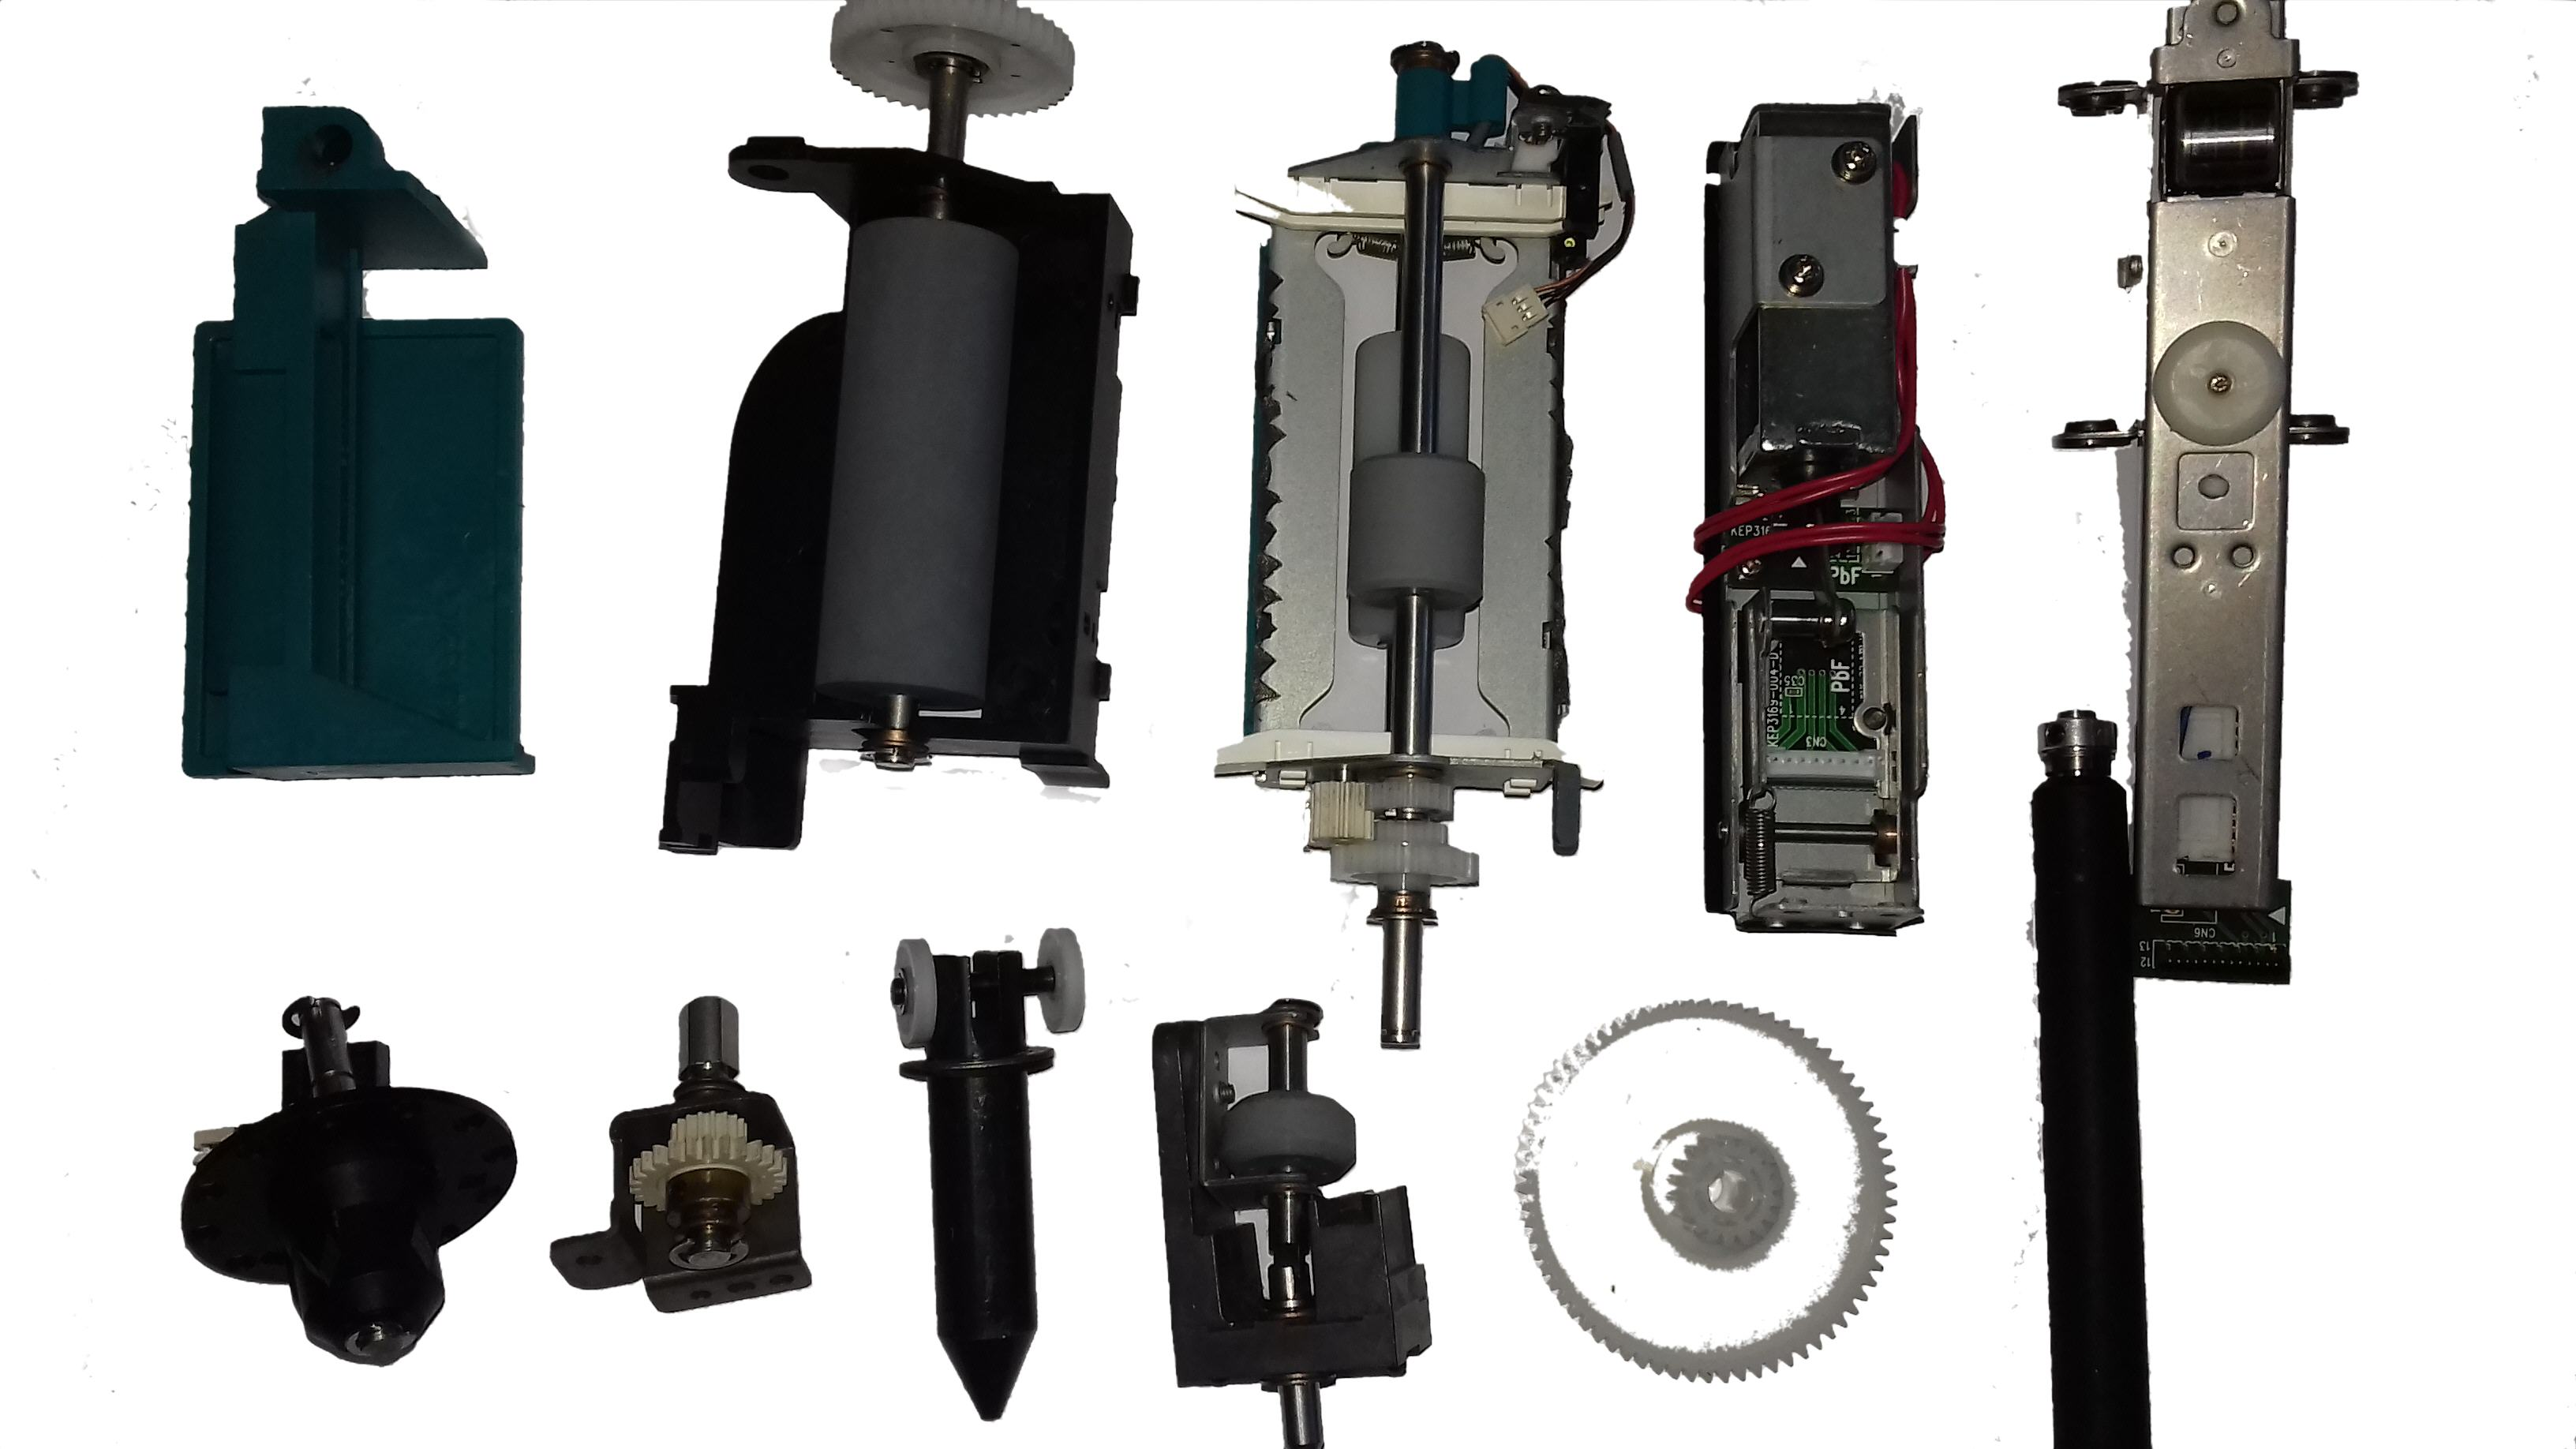 CX330_XID9300_Parts_1.jpg